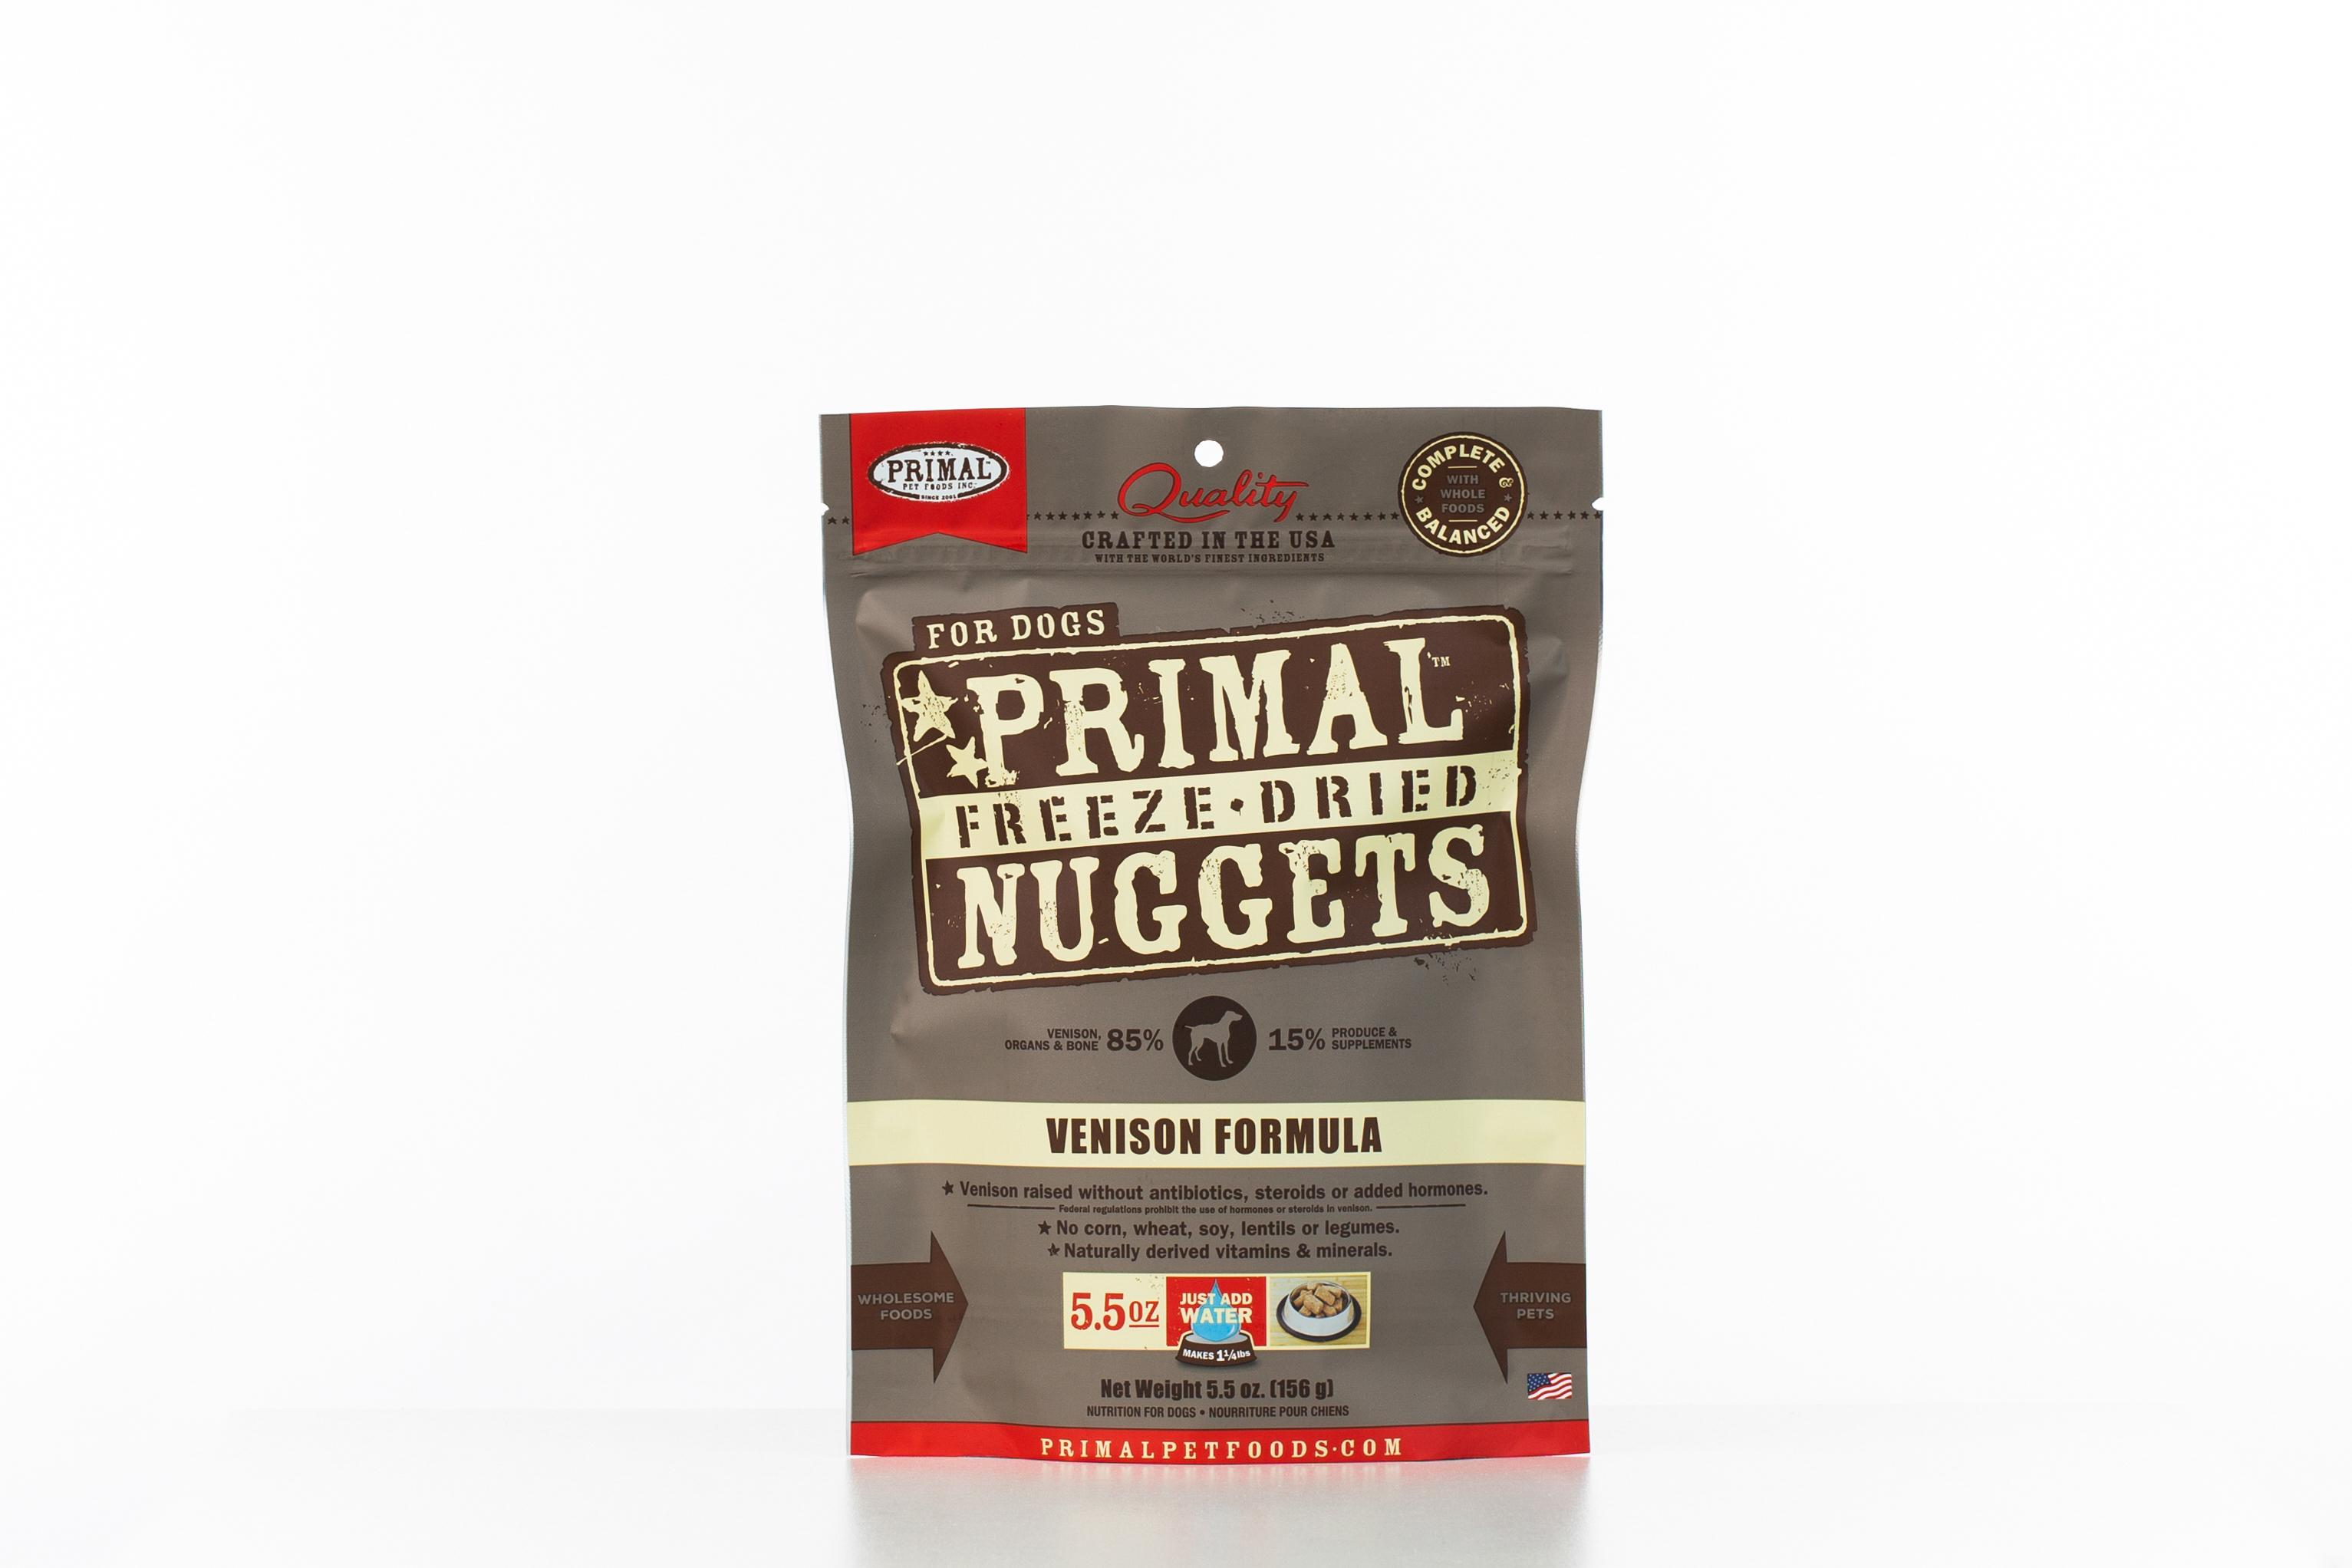 Primal Venison Formula Nuggets Grain-Free Raw Freeze-Dried Dog Food, 5.5-oz